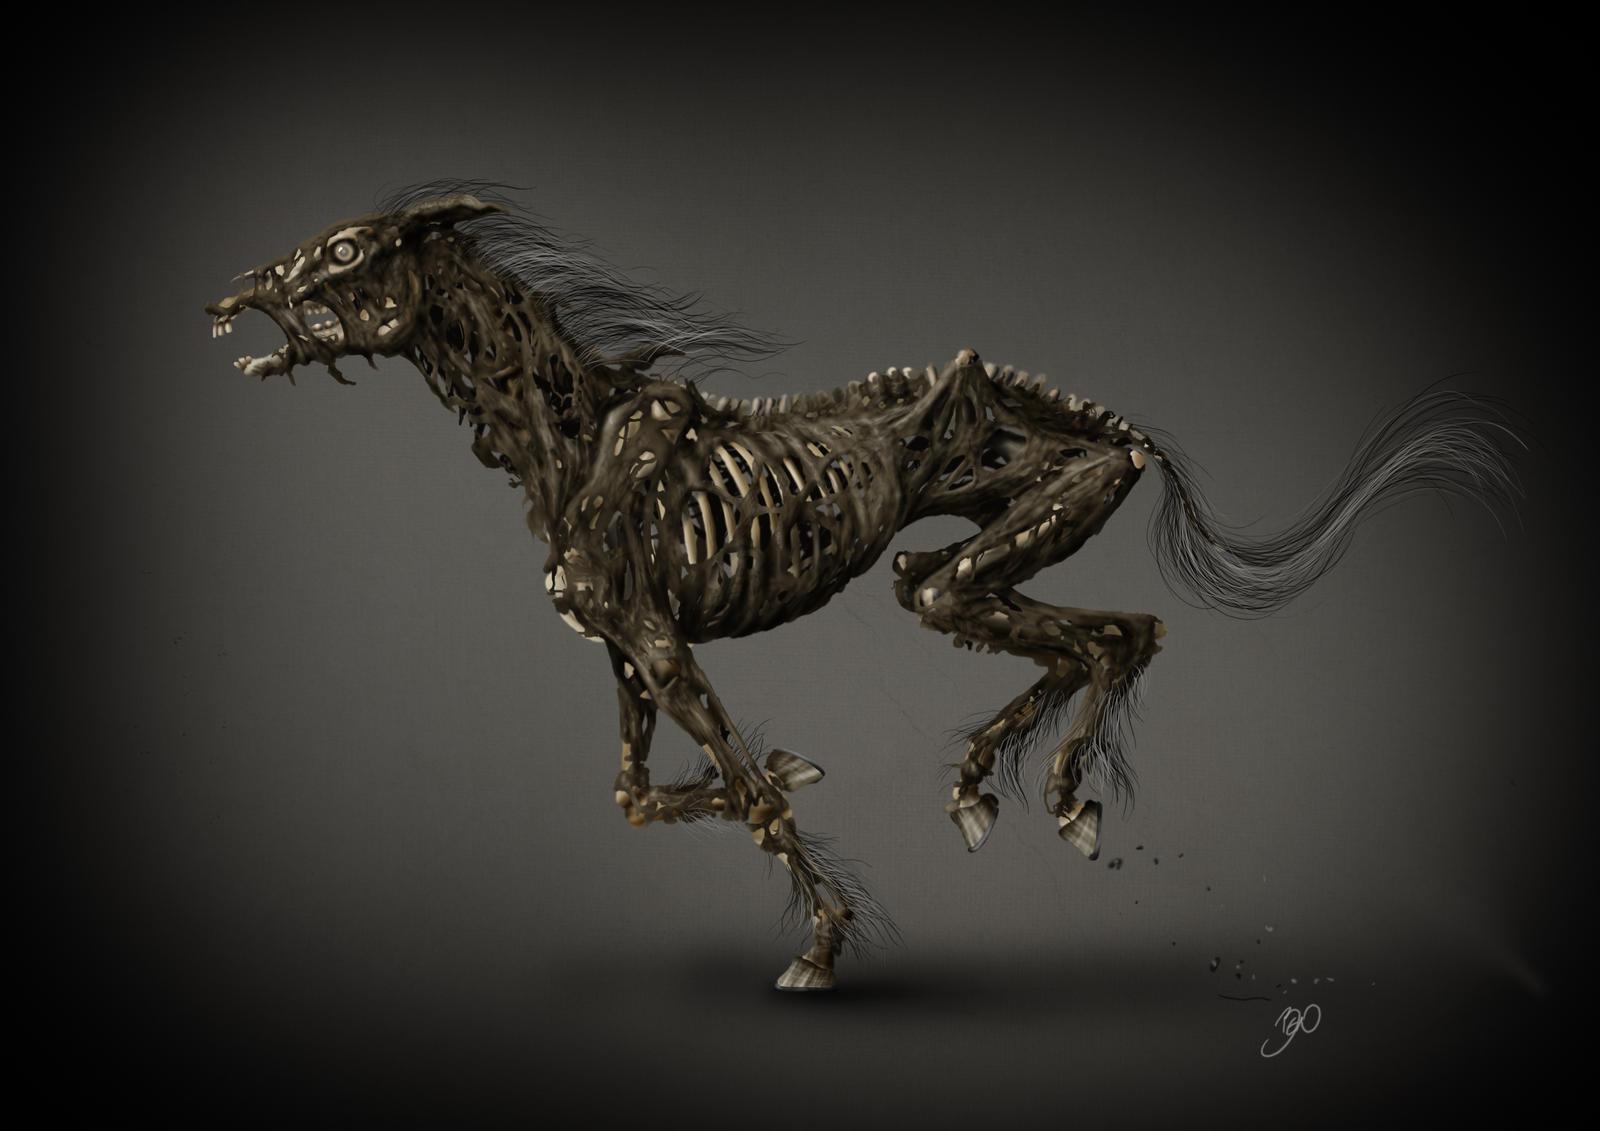 "Caos x Ordem, Missão 1: ""Como senti falta dessas correntes."" Death_horse_by_bedeekin-d5kxpoz"